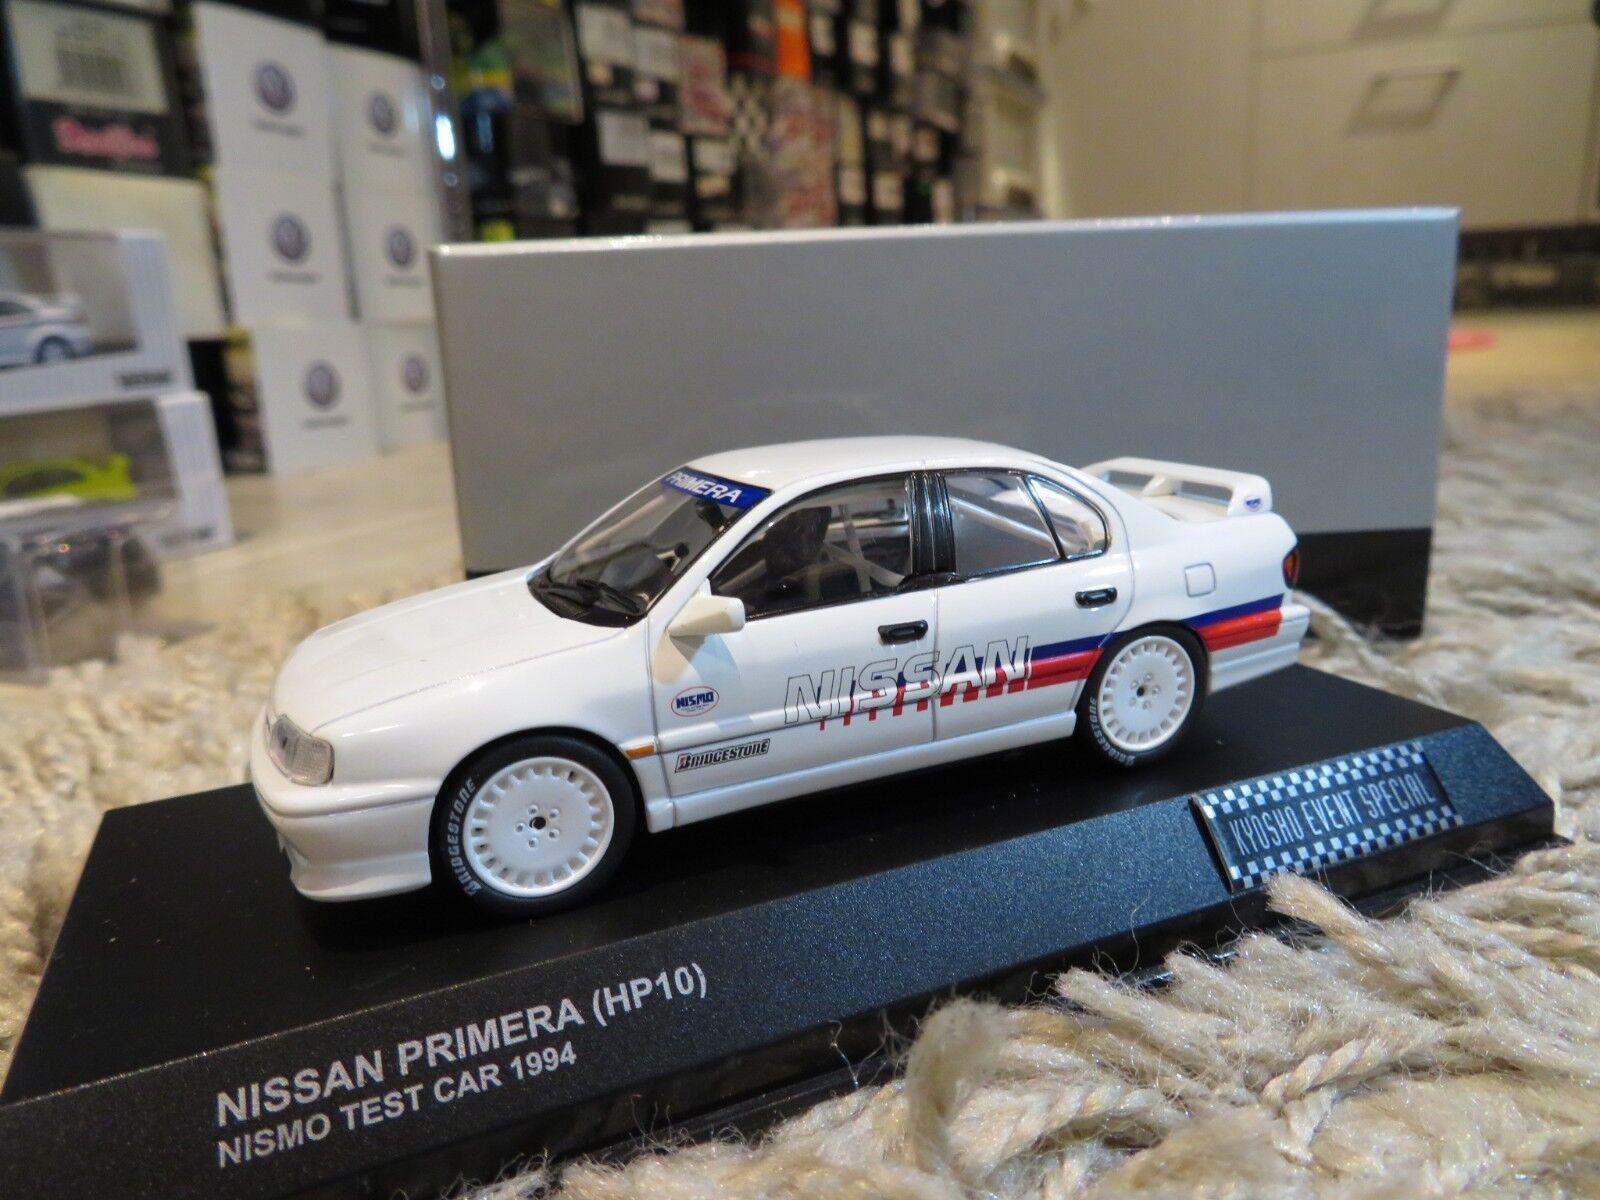 Kyosho Nissan Primera HP10 NISMO Test Car (1994) diecast